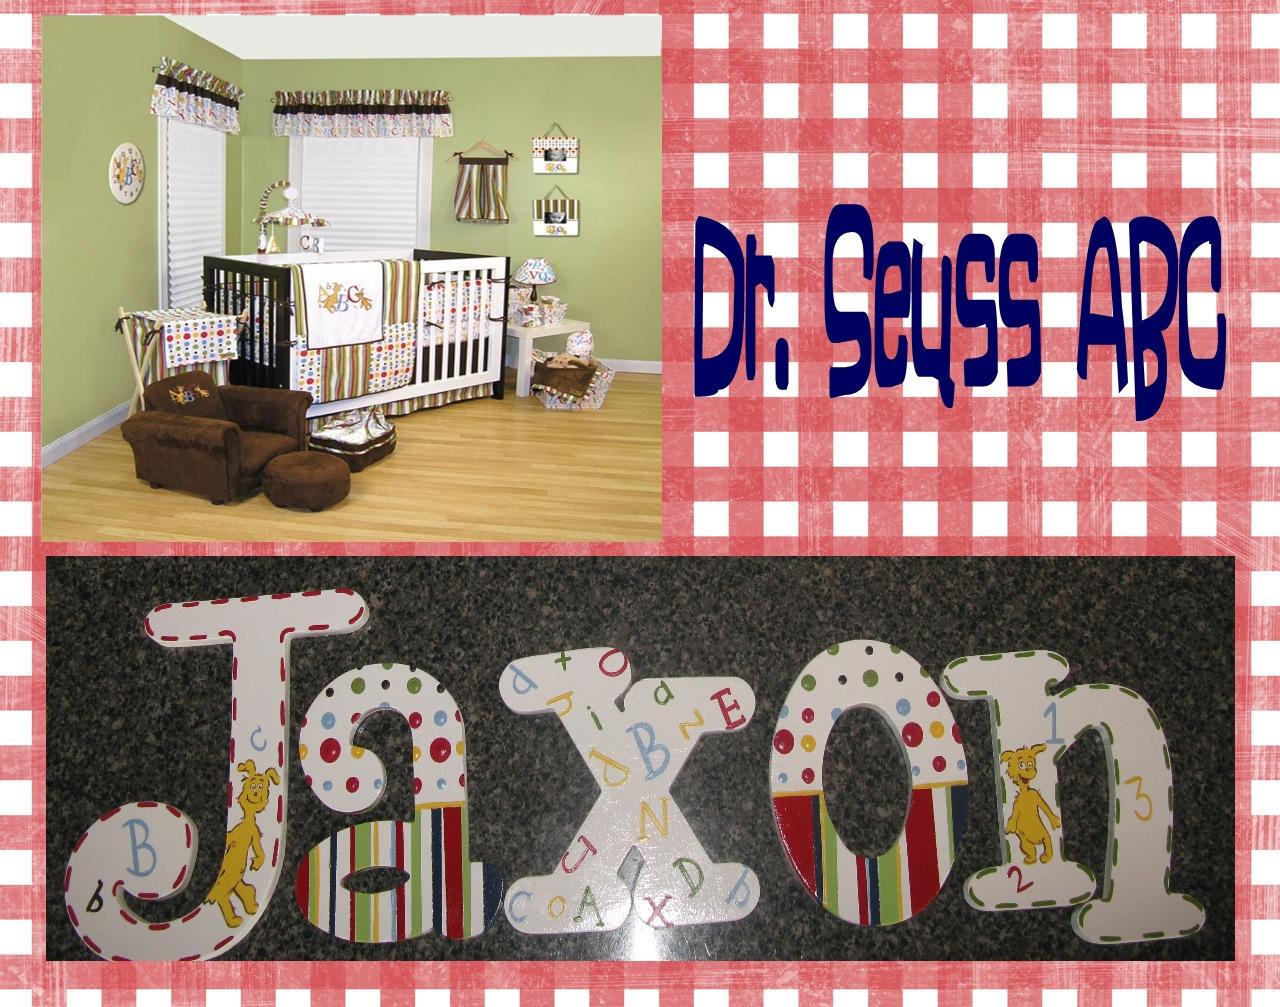 Dr. Seuss Hand Painted ABC Nursery Letters